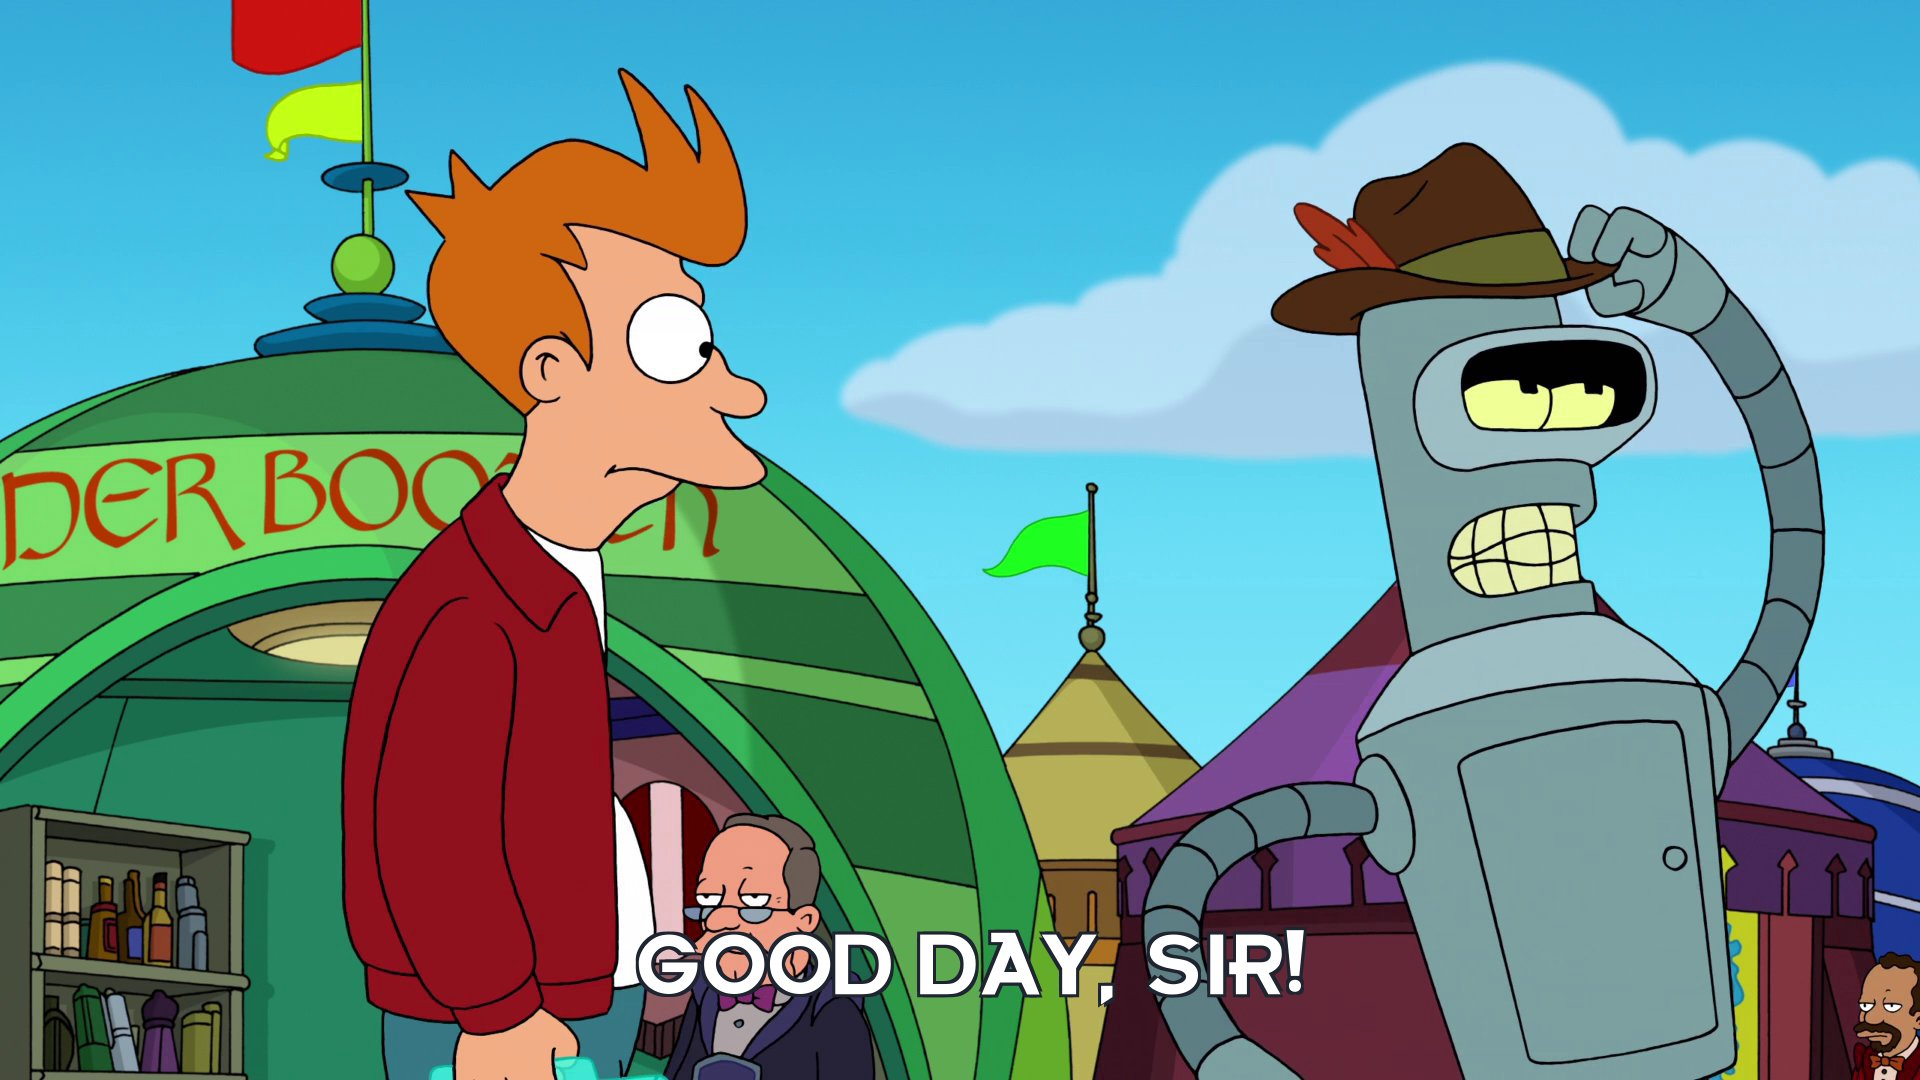 Bender Bending Rodriguez: Good day, sir!